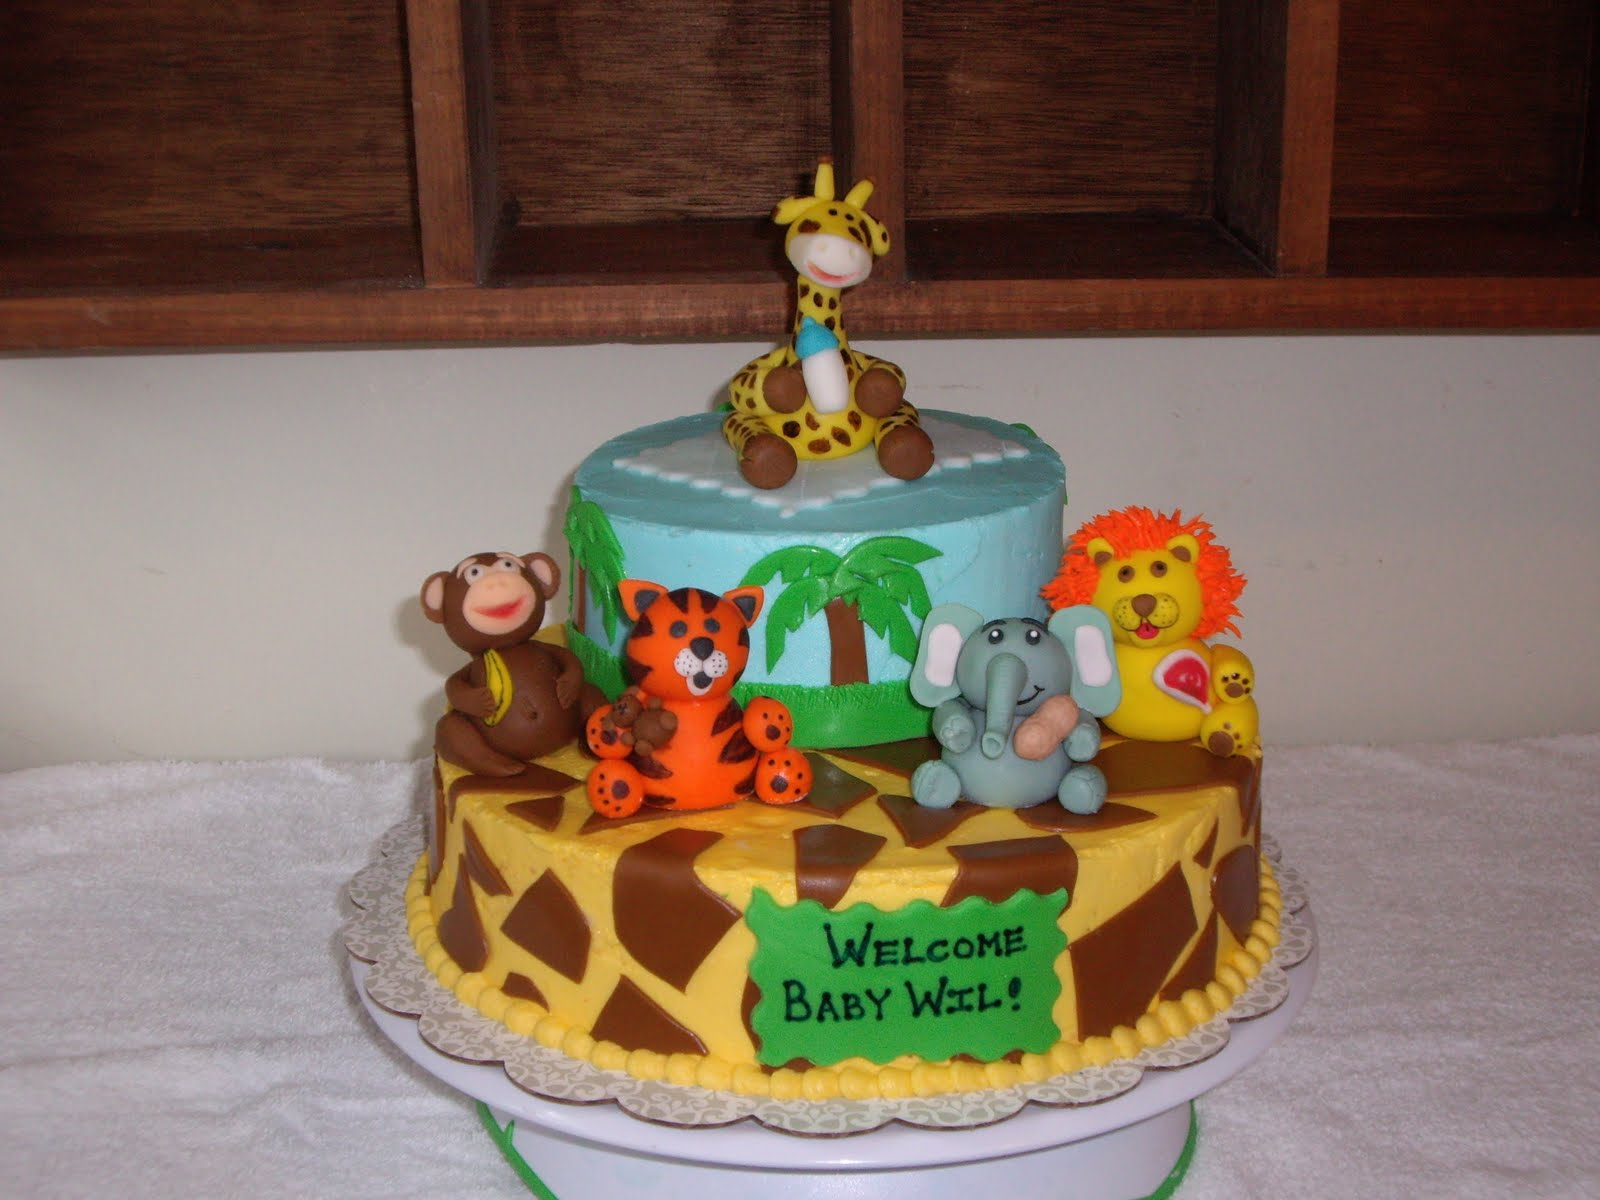 Animal theme baby shower cakes - Baby Shower Decoration Ideas